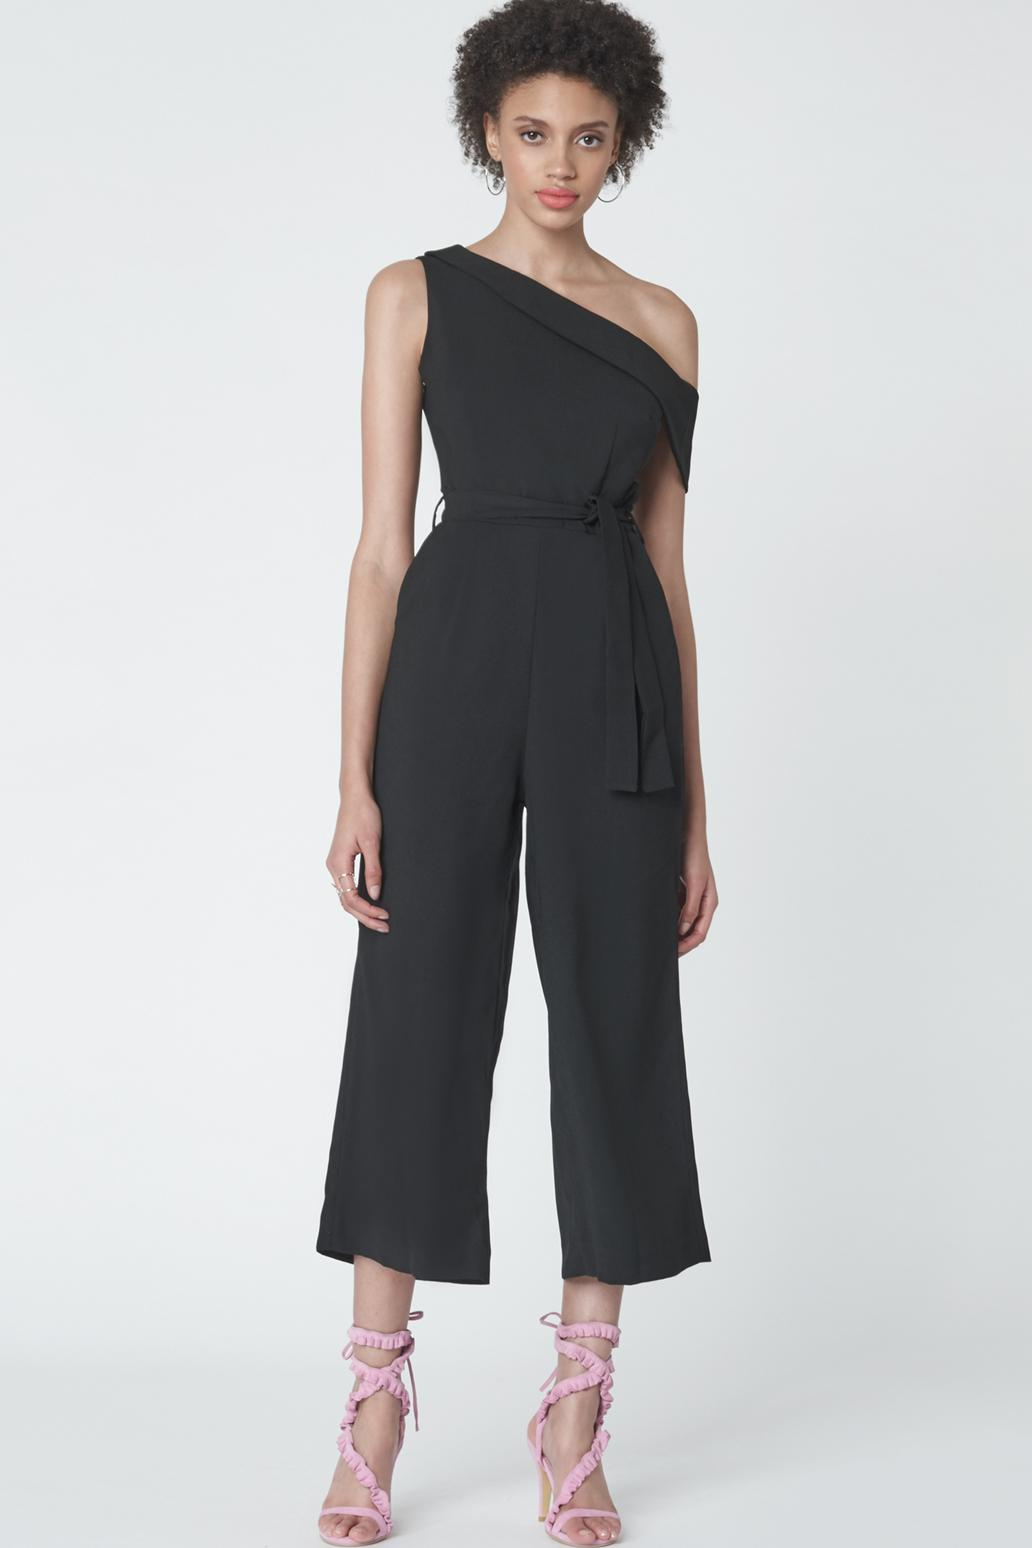 d9c96a043b7 Lyst - Lavish Alice Cropped Leg Asymmetric Jumpsuit In Black in Black